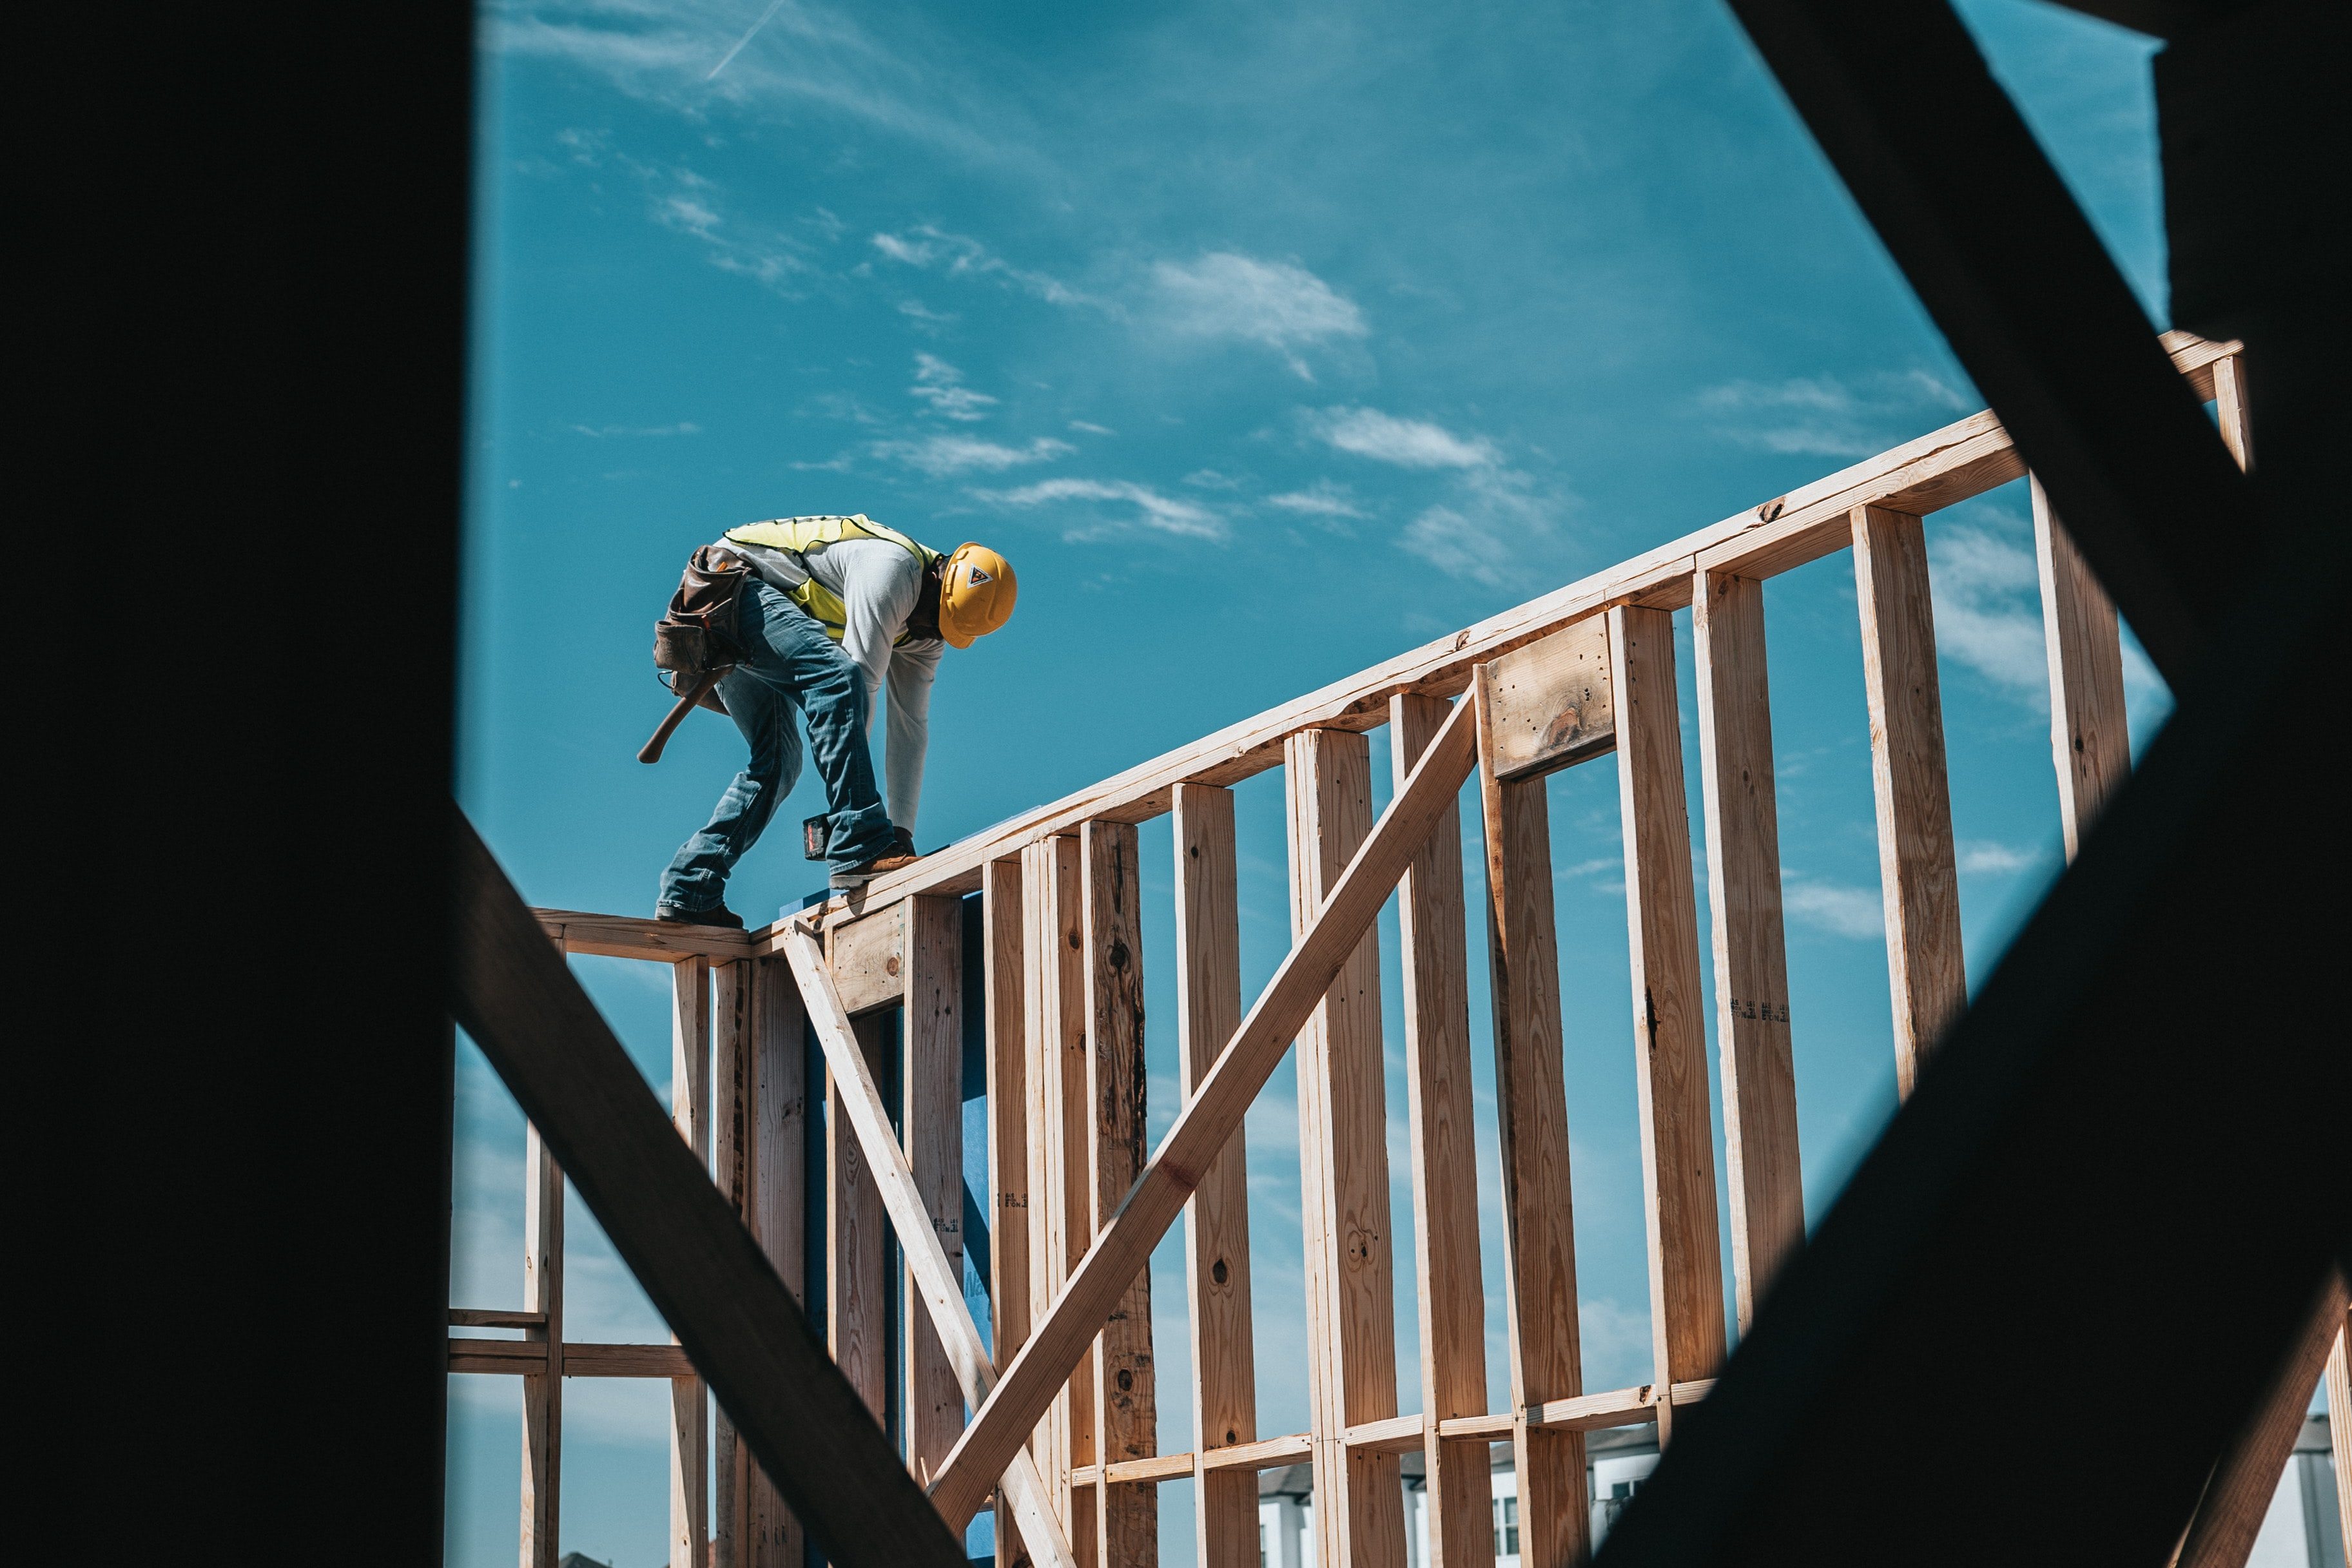 man-working-wood-framed-house